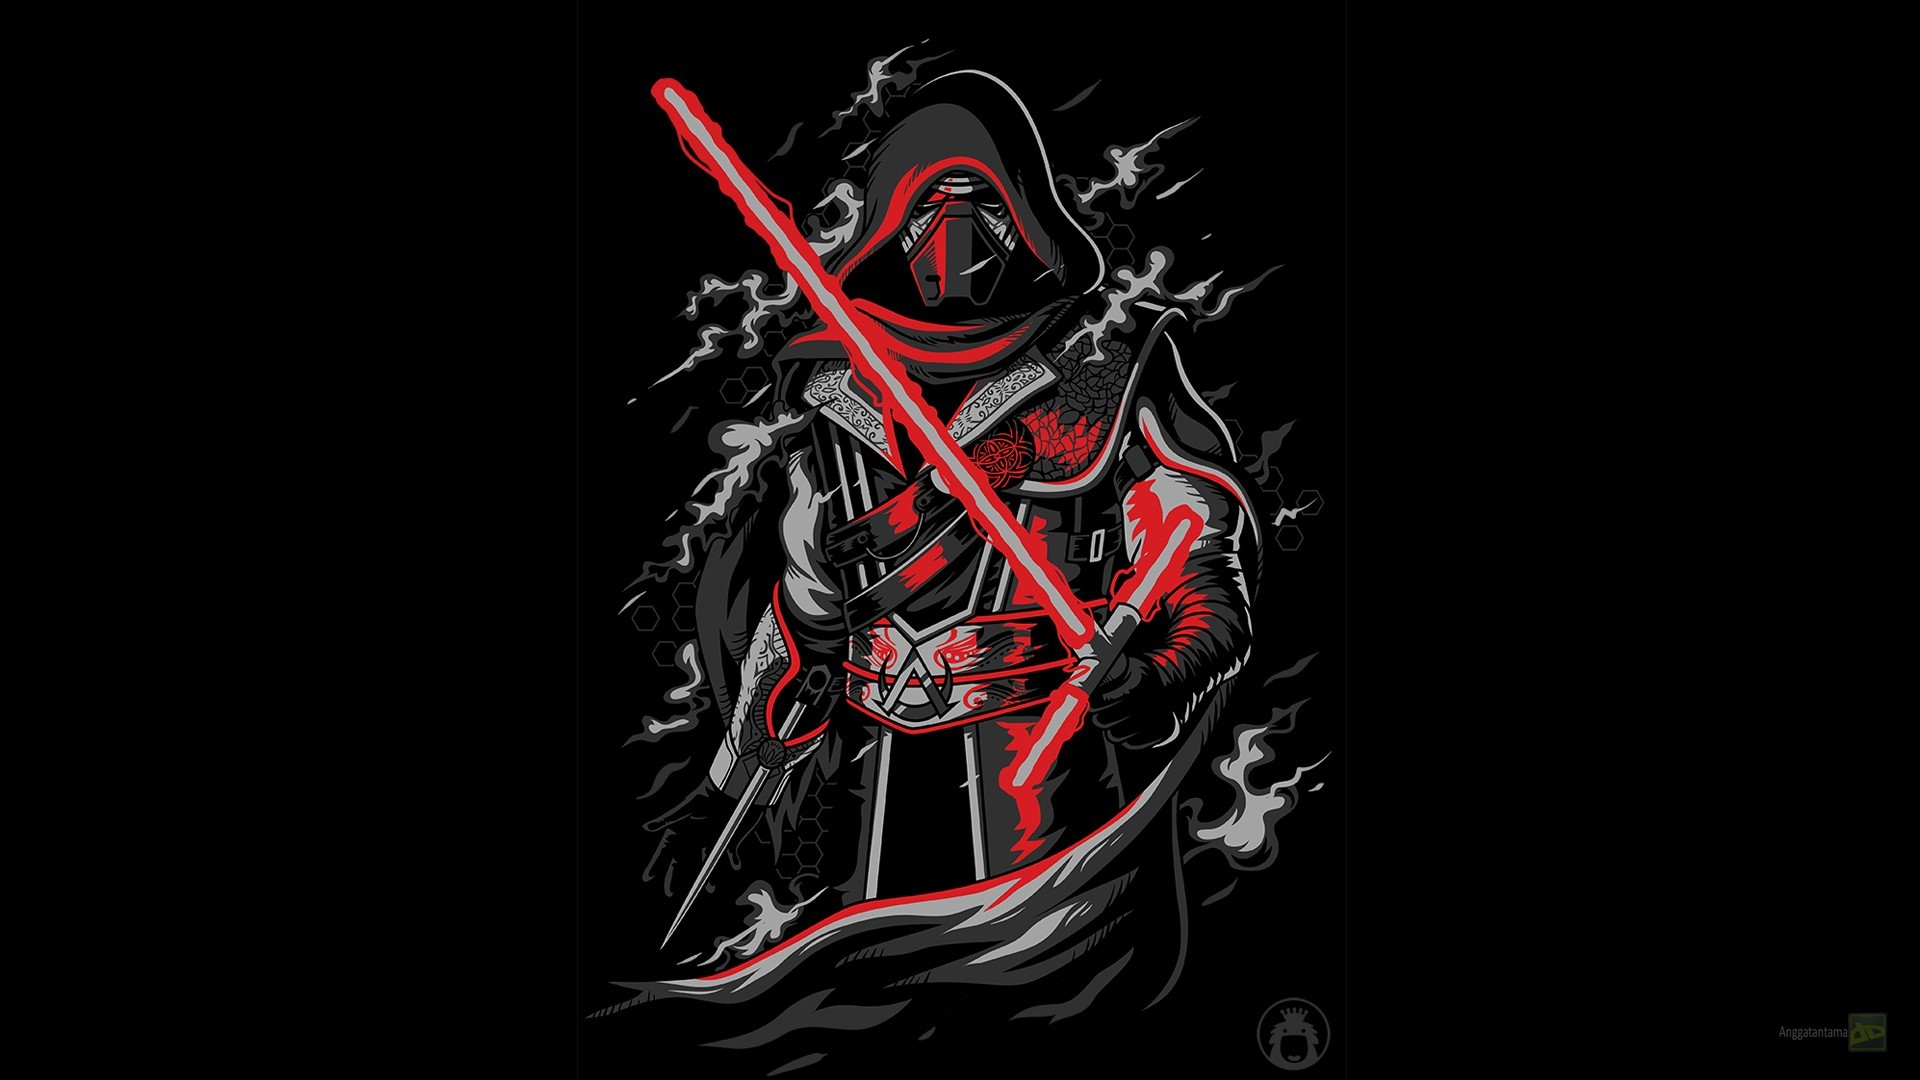 General Assassin's Creed Star Wars Kylo Ren